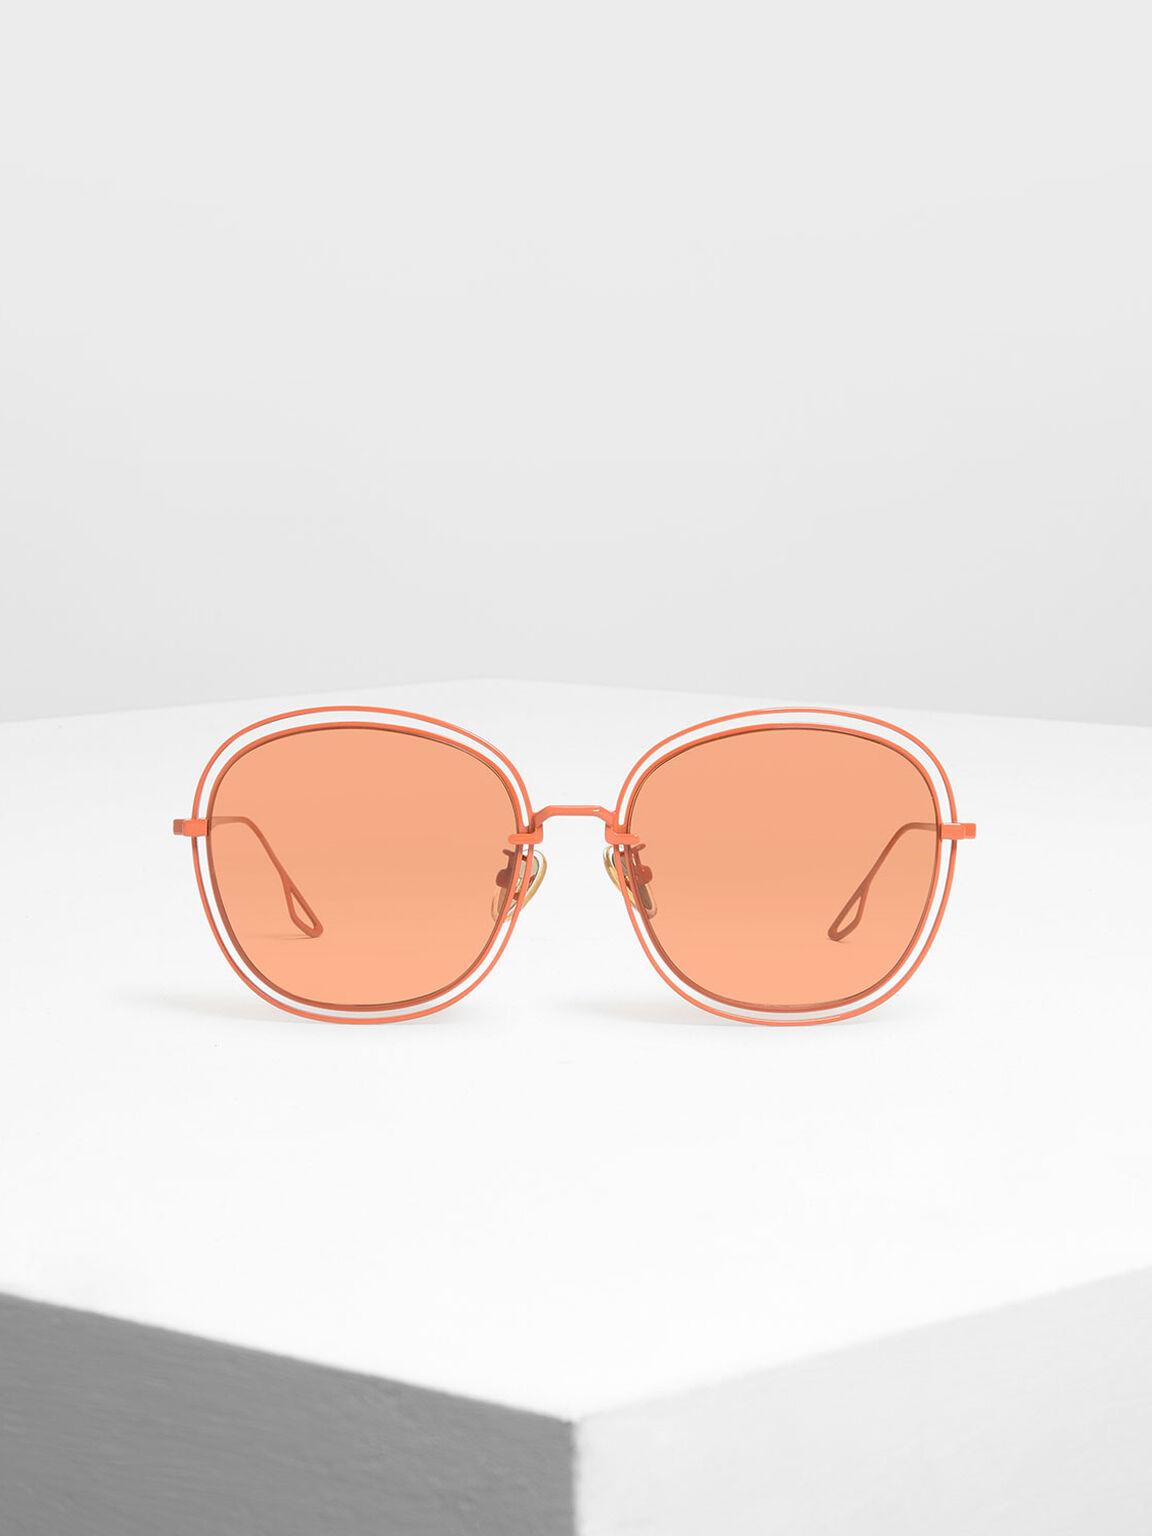 Double Wire Frame Shades, Orange, hi-res